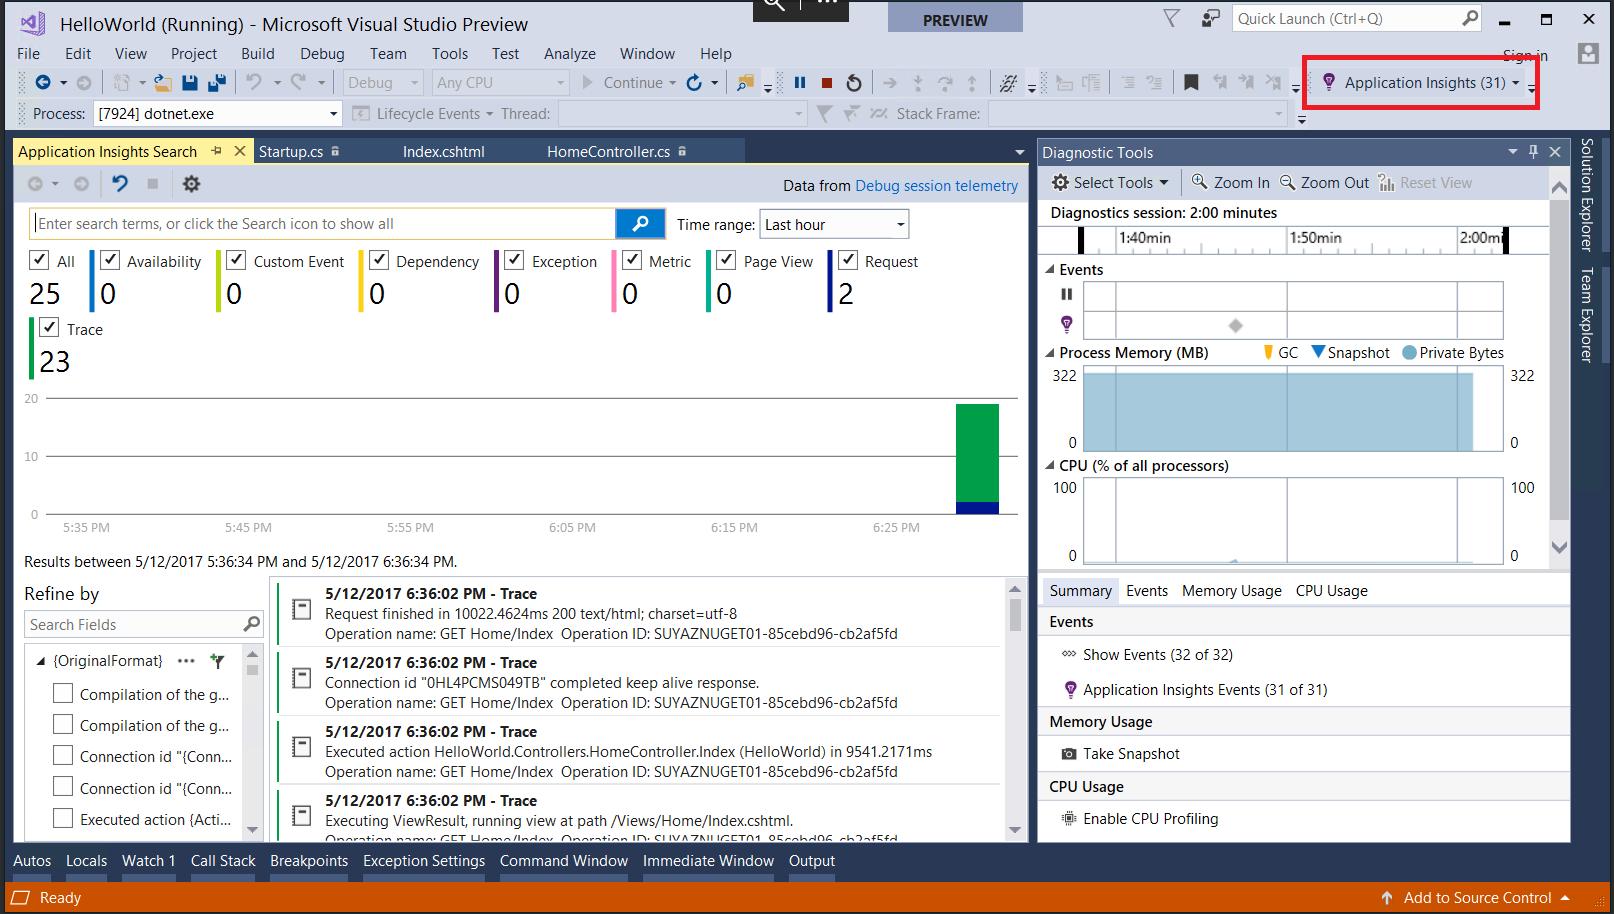 ASP.NET Core 2.0 - Integrated Azure Application Insights and diagnostics